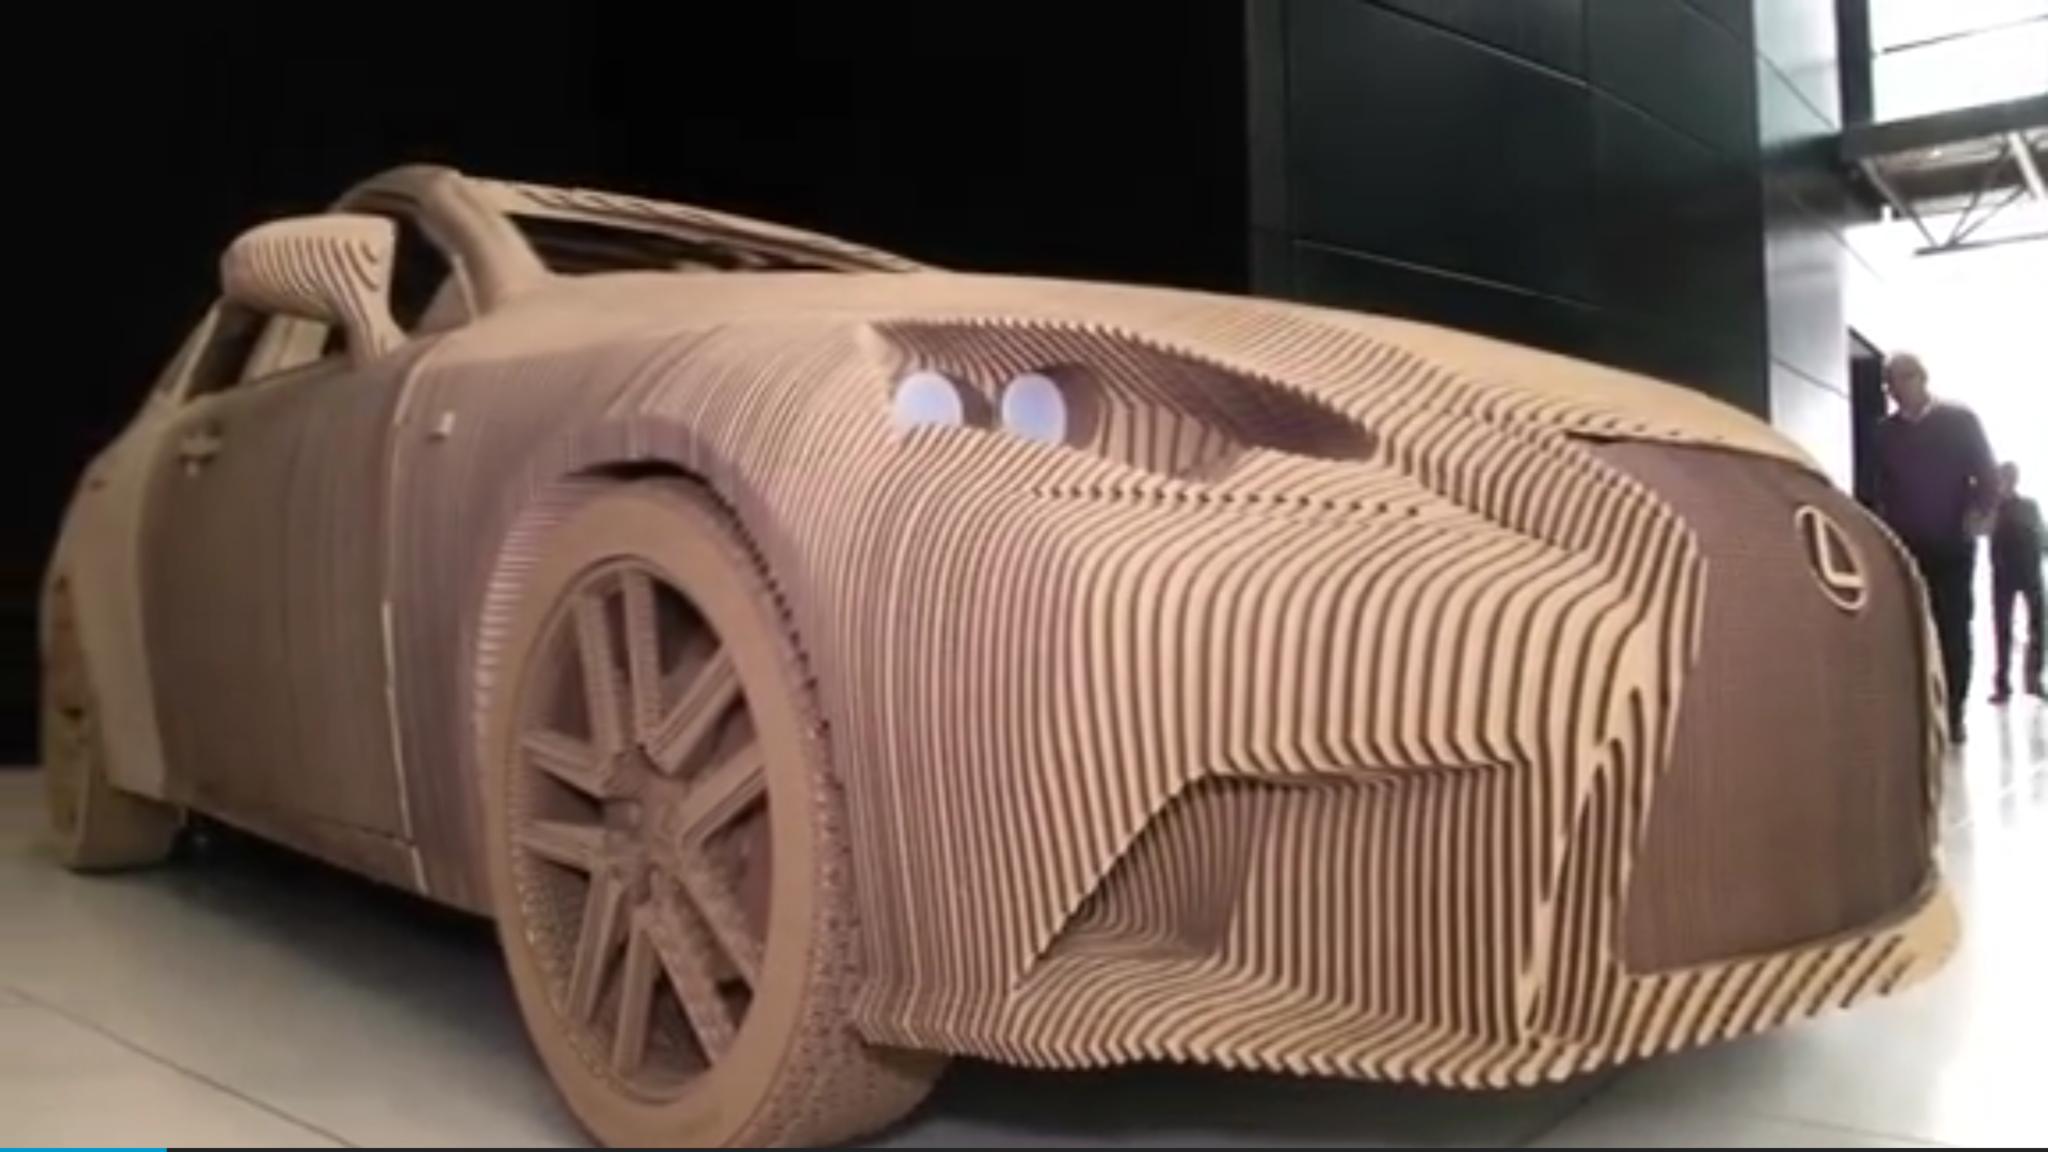 Lexus Builds Origami Inspired Cardboard Car